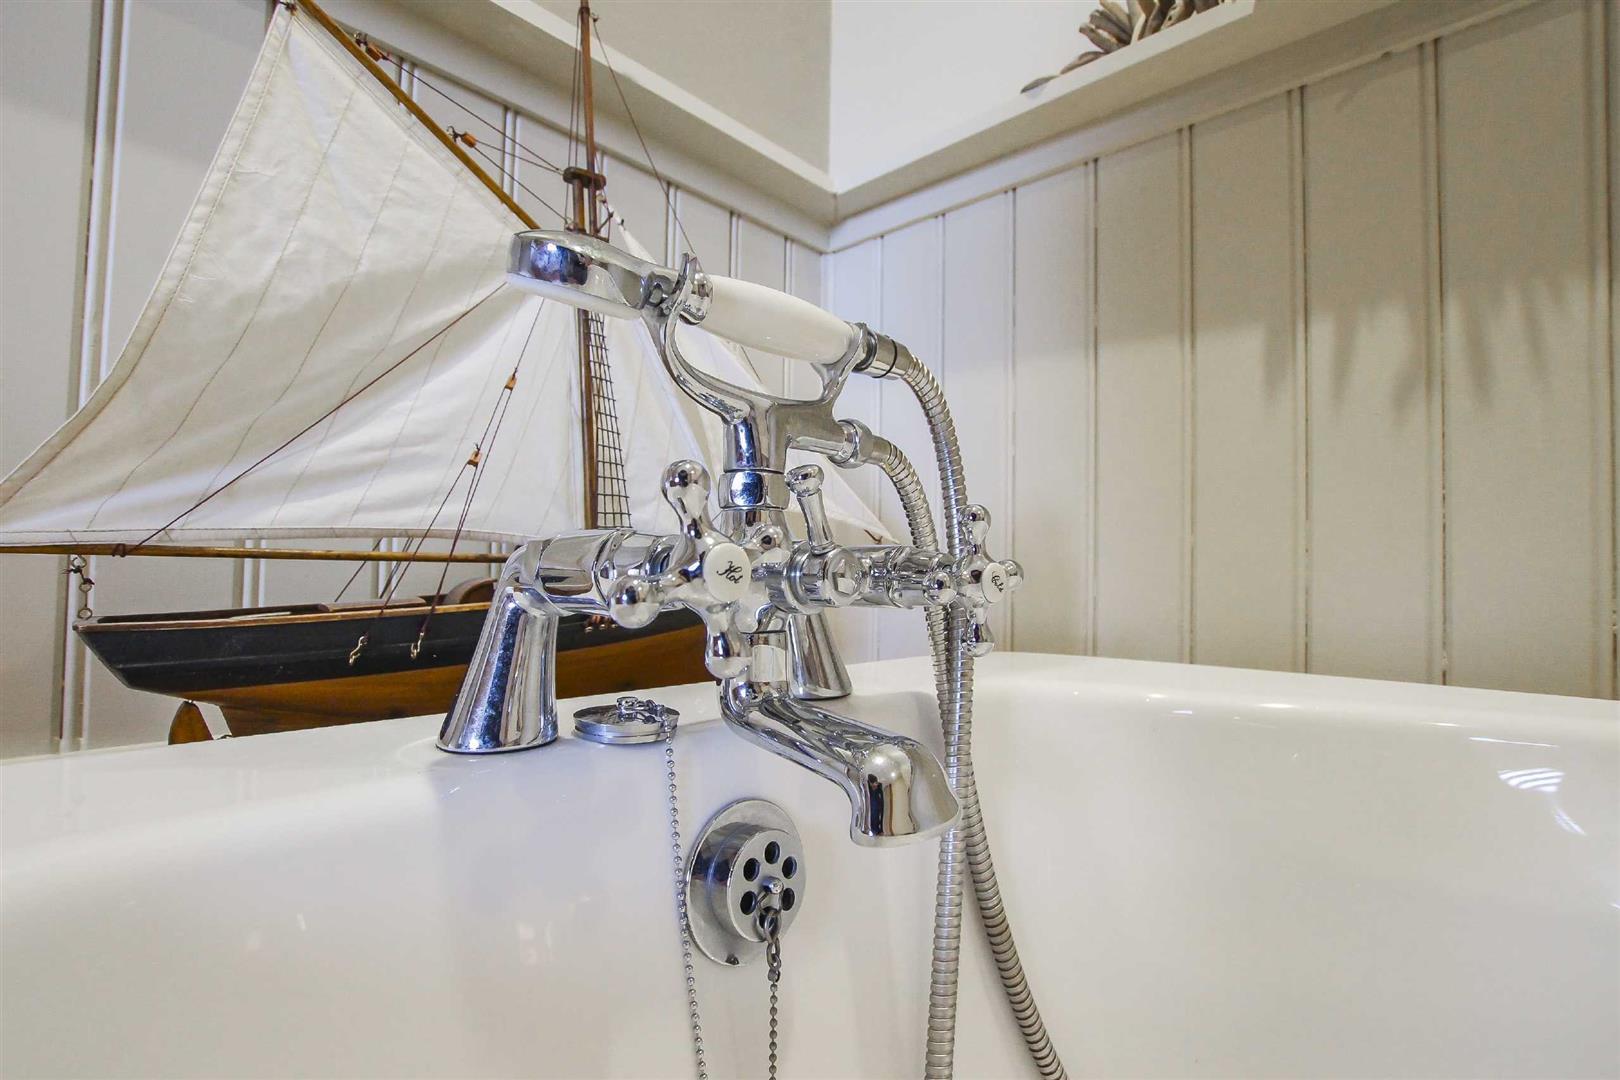 5 Bedroom Barn Conversion For Sale - p026519_15.jpg